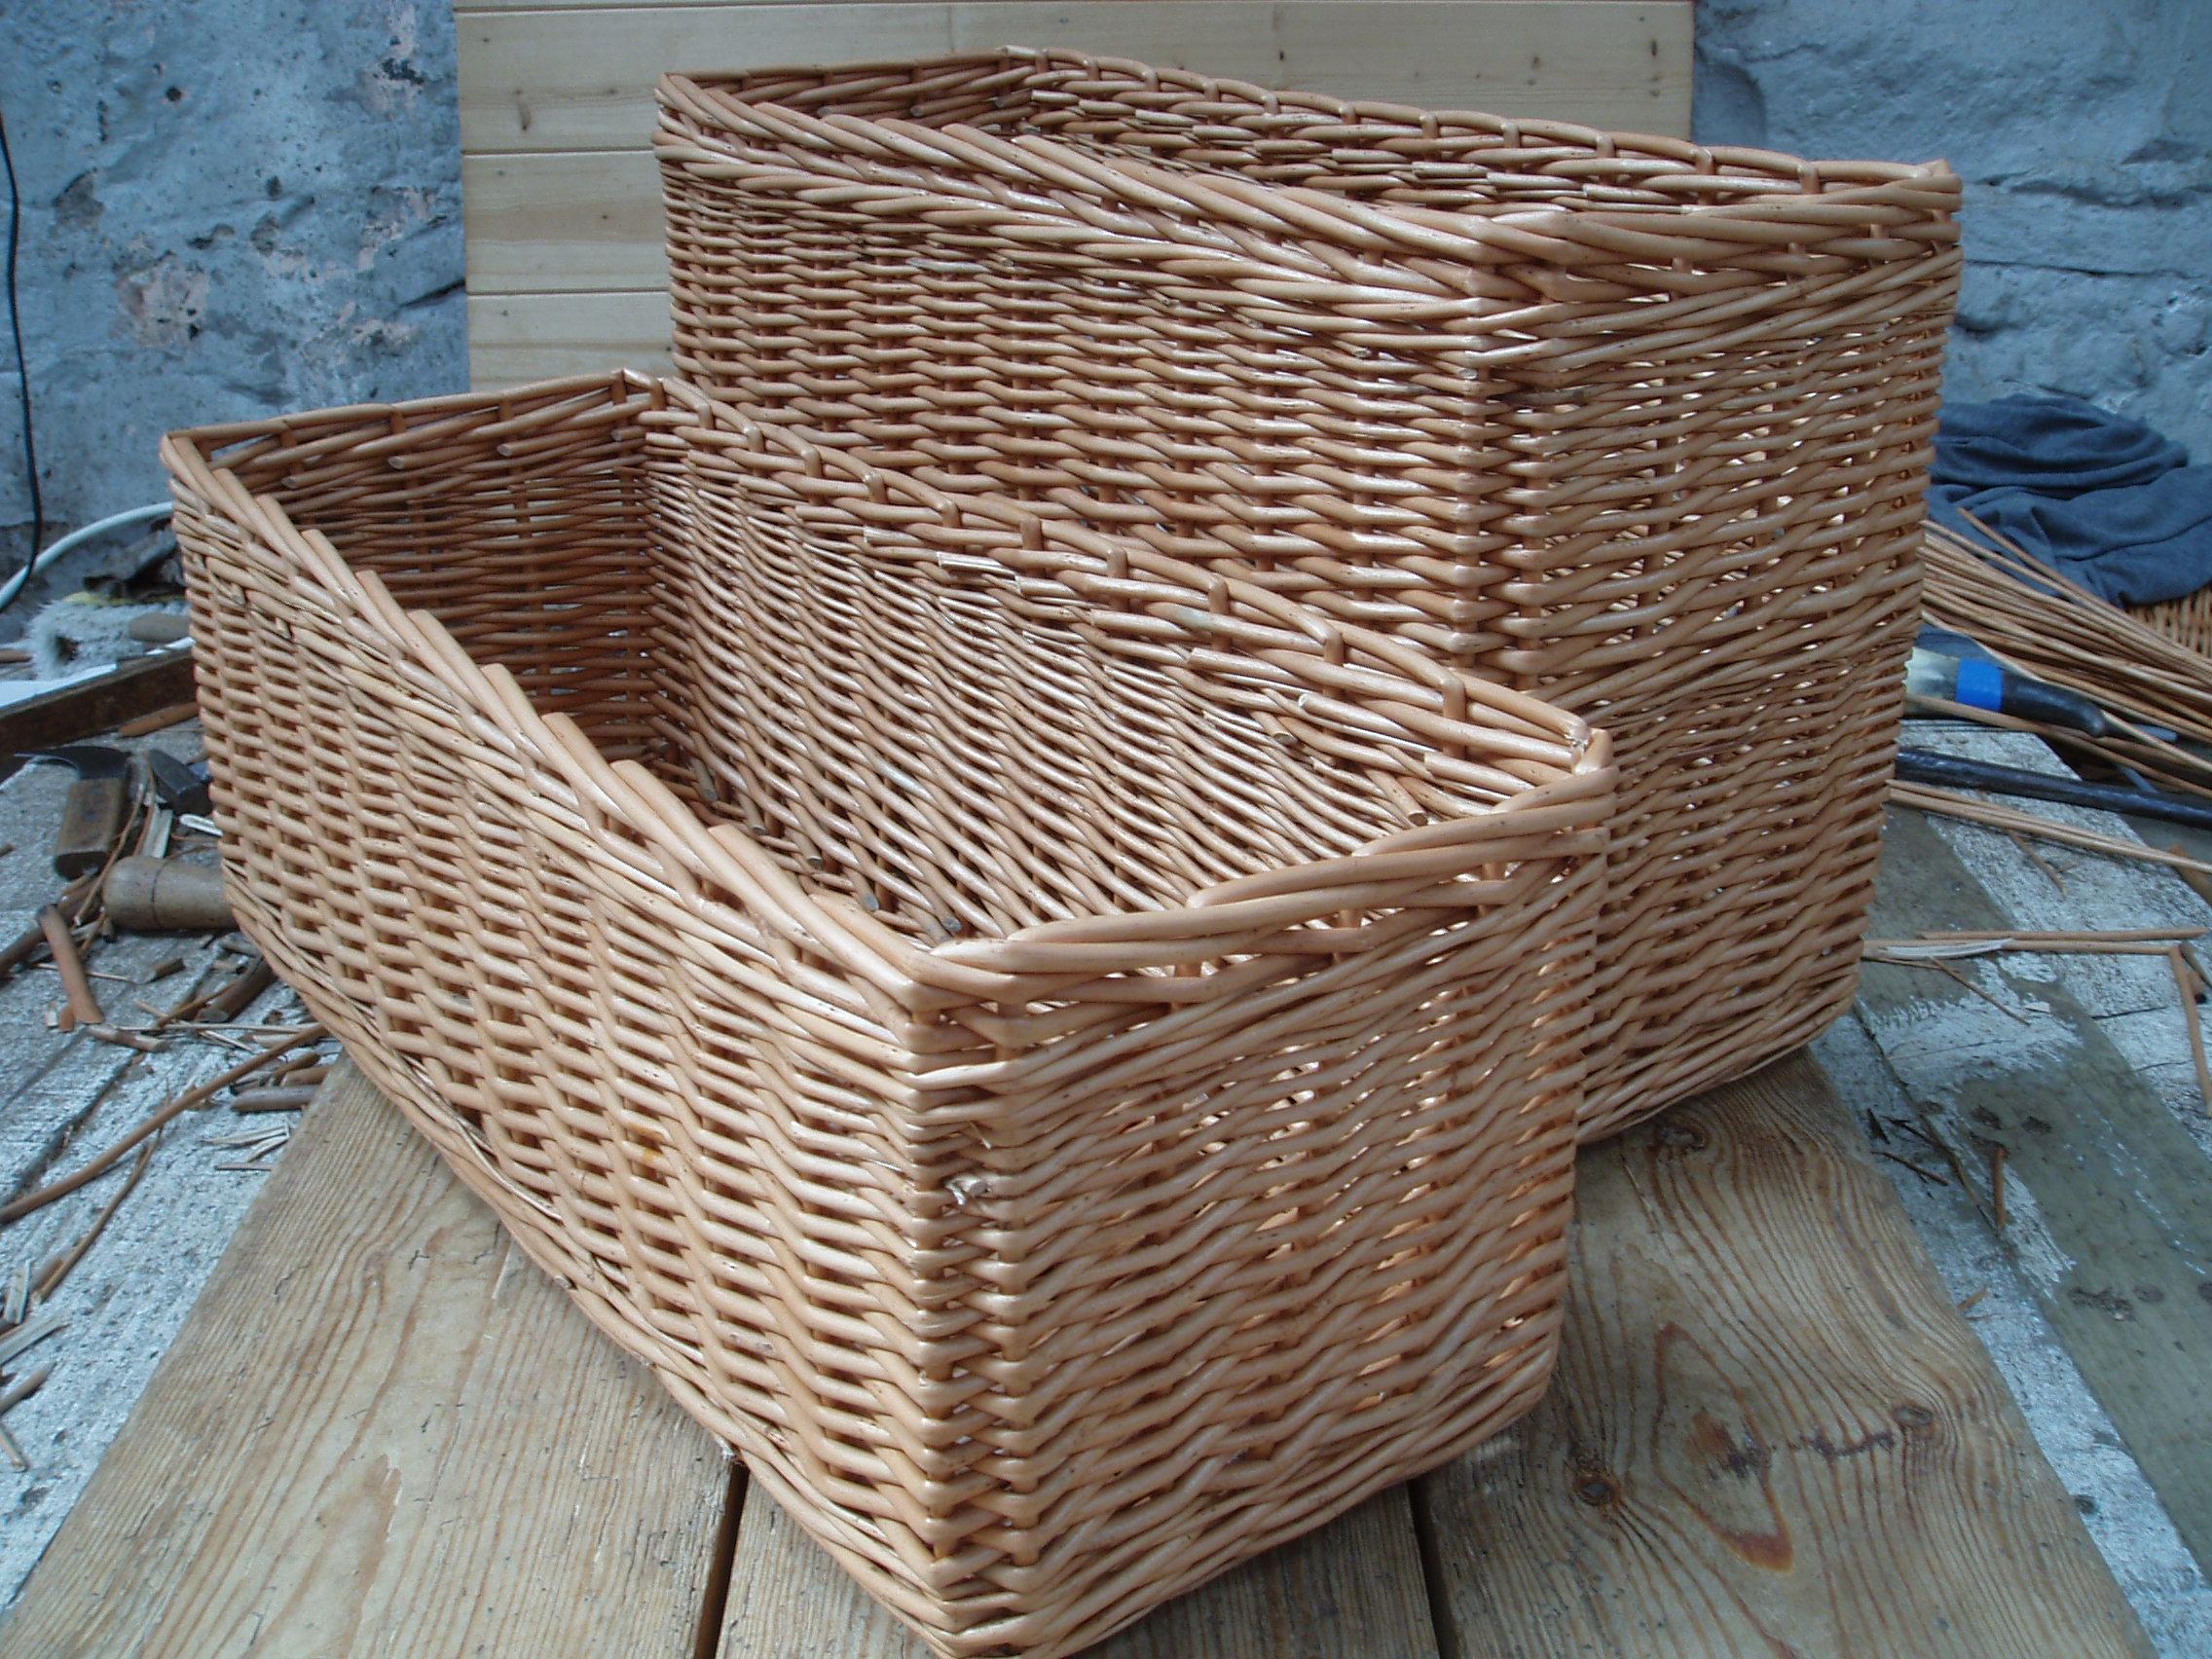 Genial ID 203 For Long Narrow Baskets For Storage, Image Source:  Hastingwoodbasketworks.com